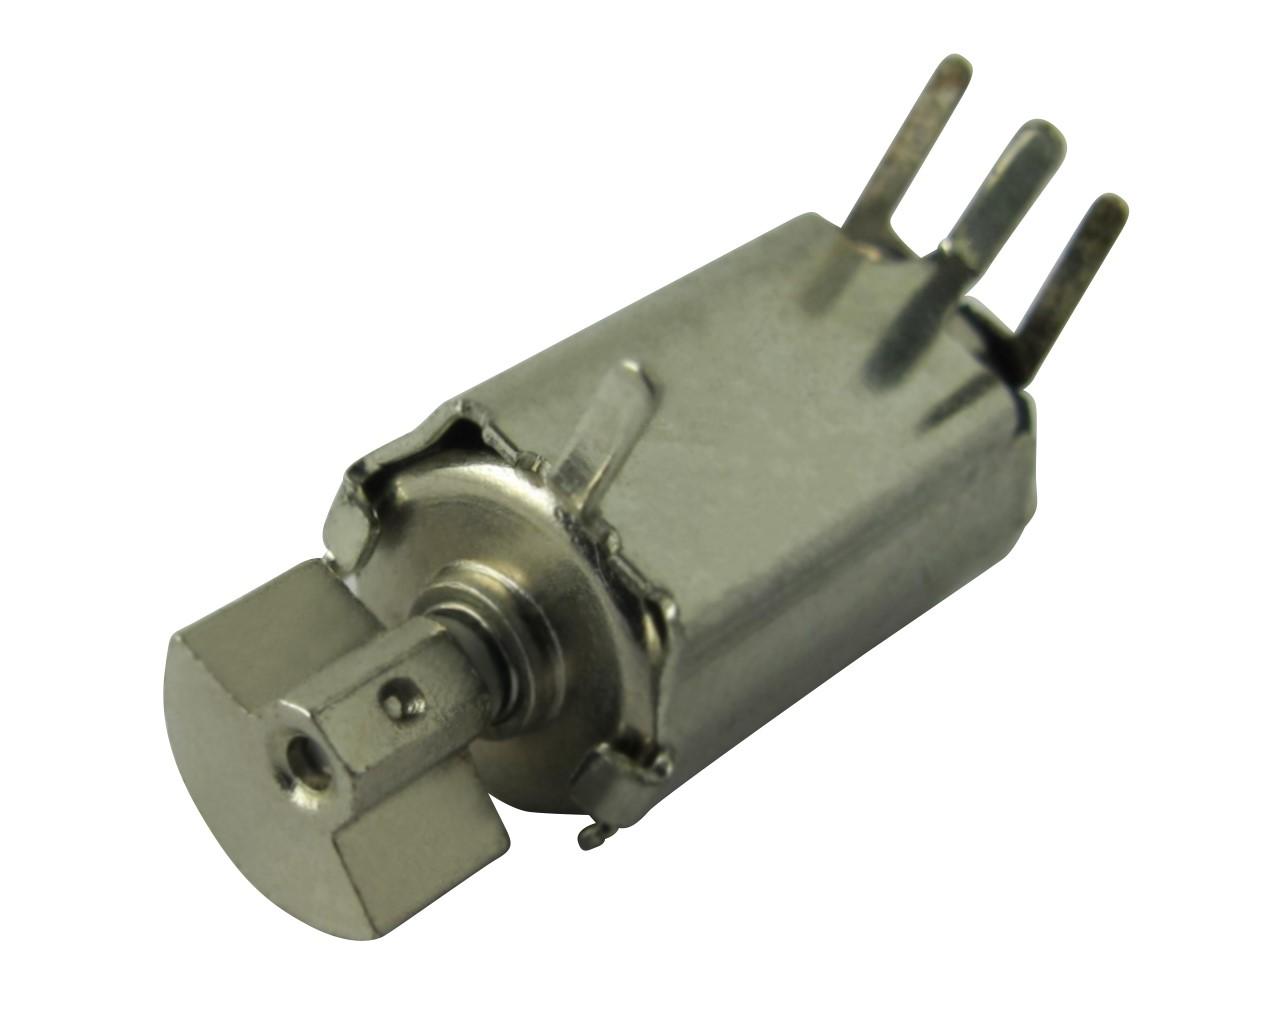 Z6SCAB0061141 Cylindrical Vibrator Motor